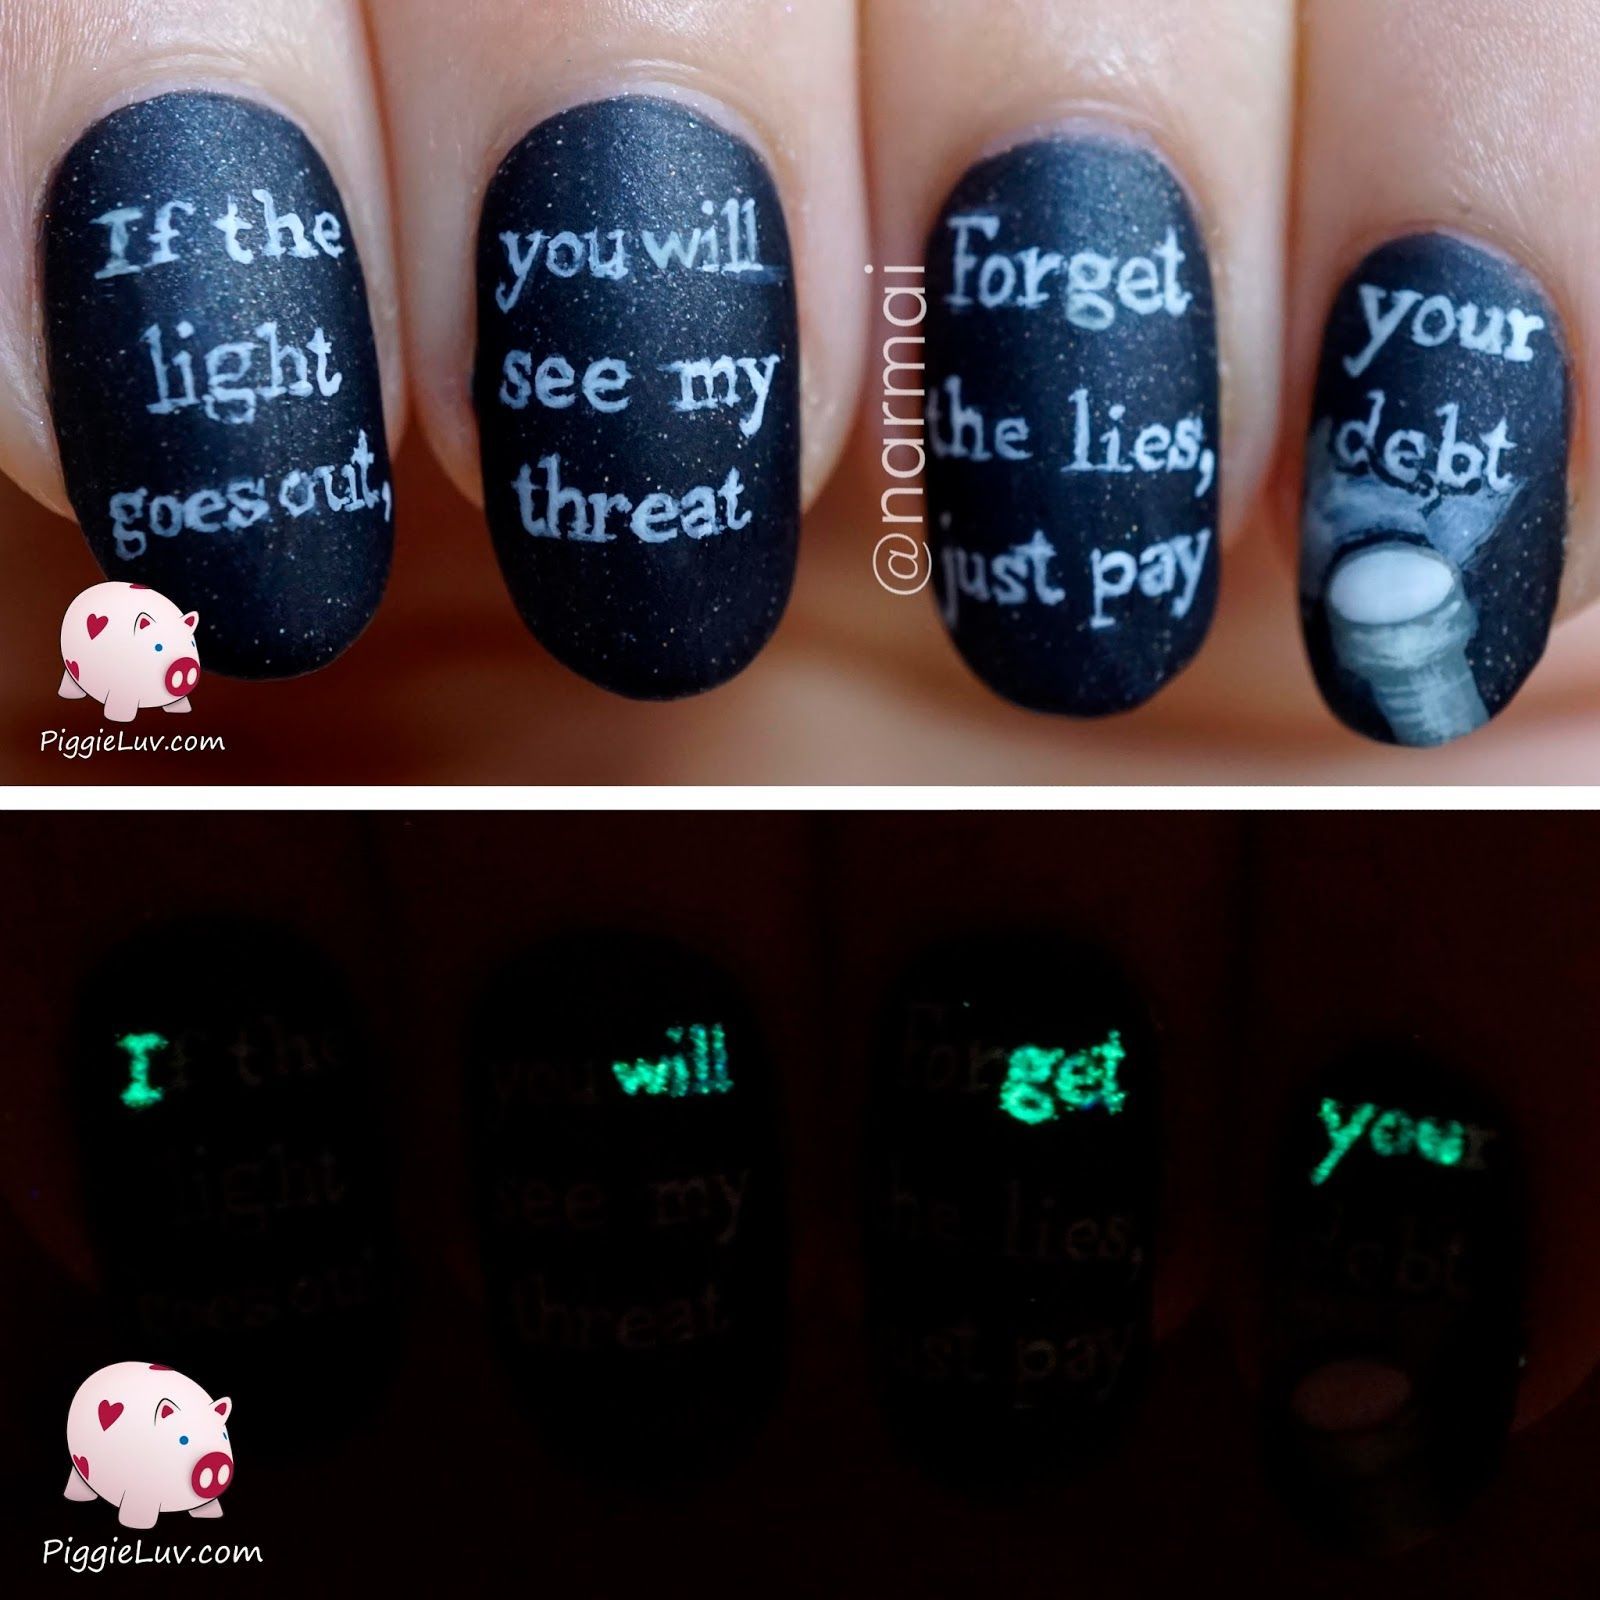 Glow in the dark threat message nail art | Creepy stuff, Creepy and ...